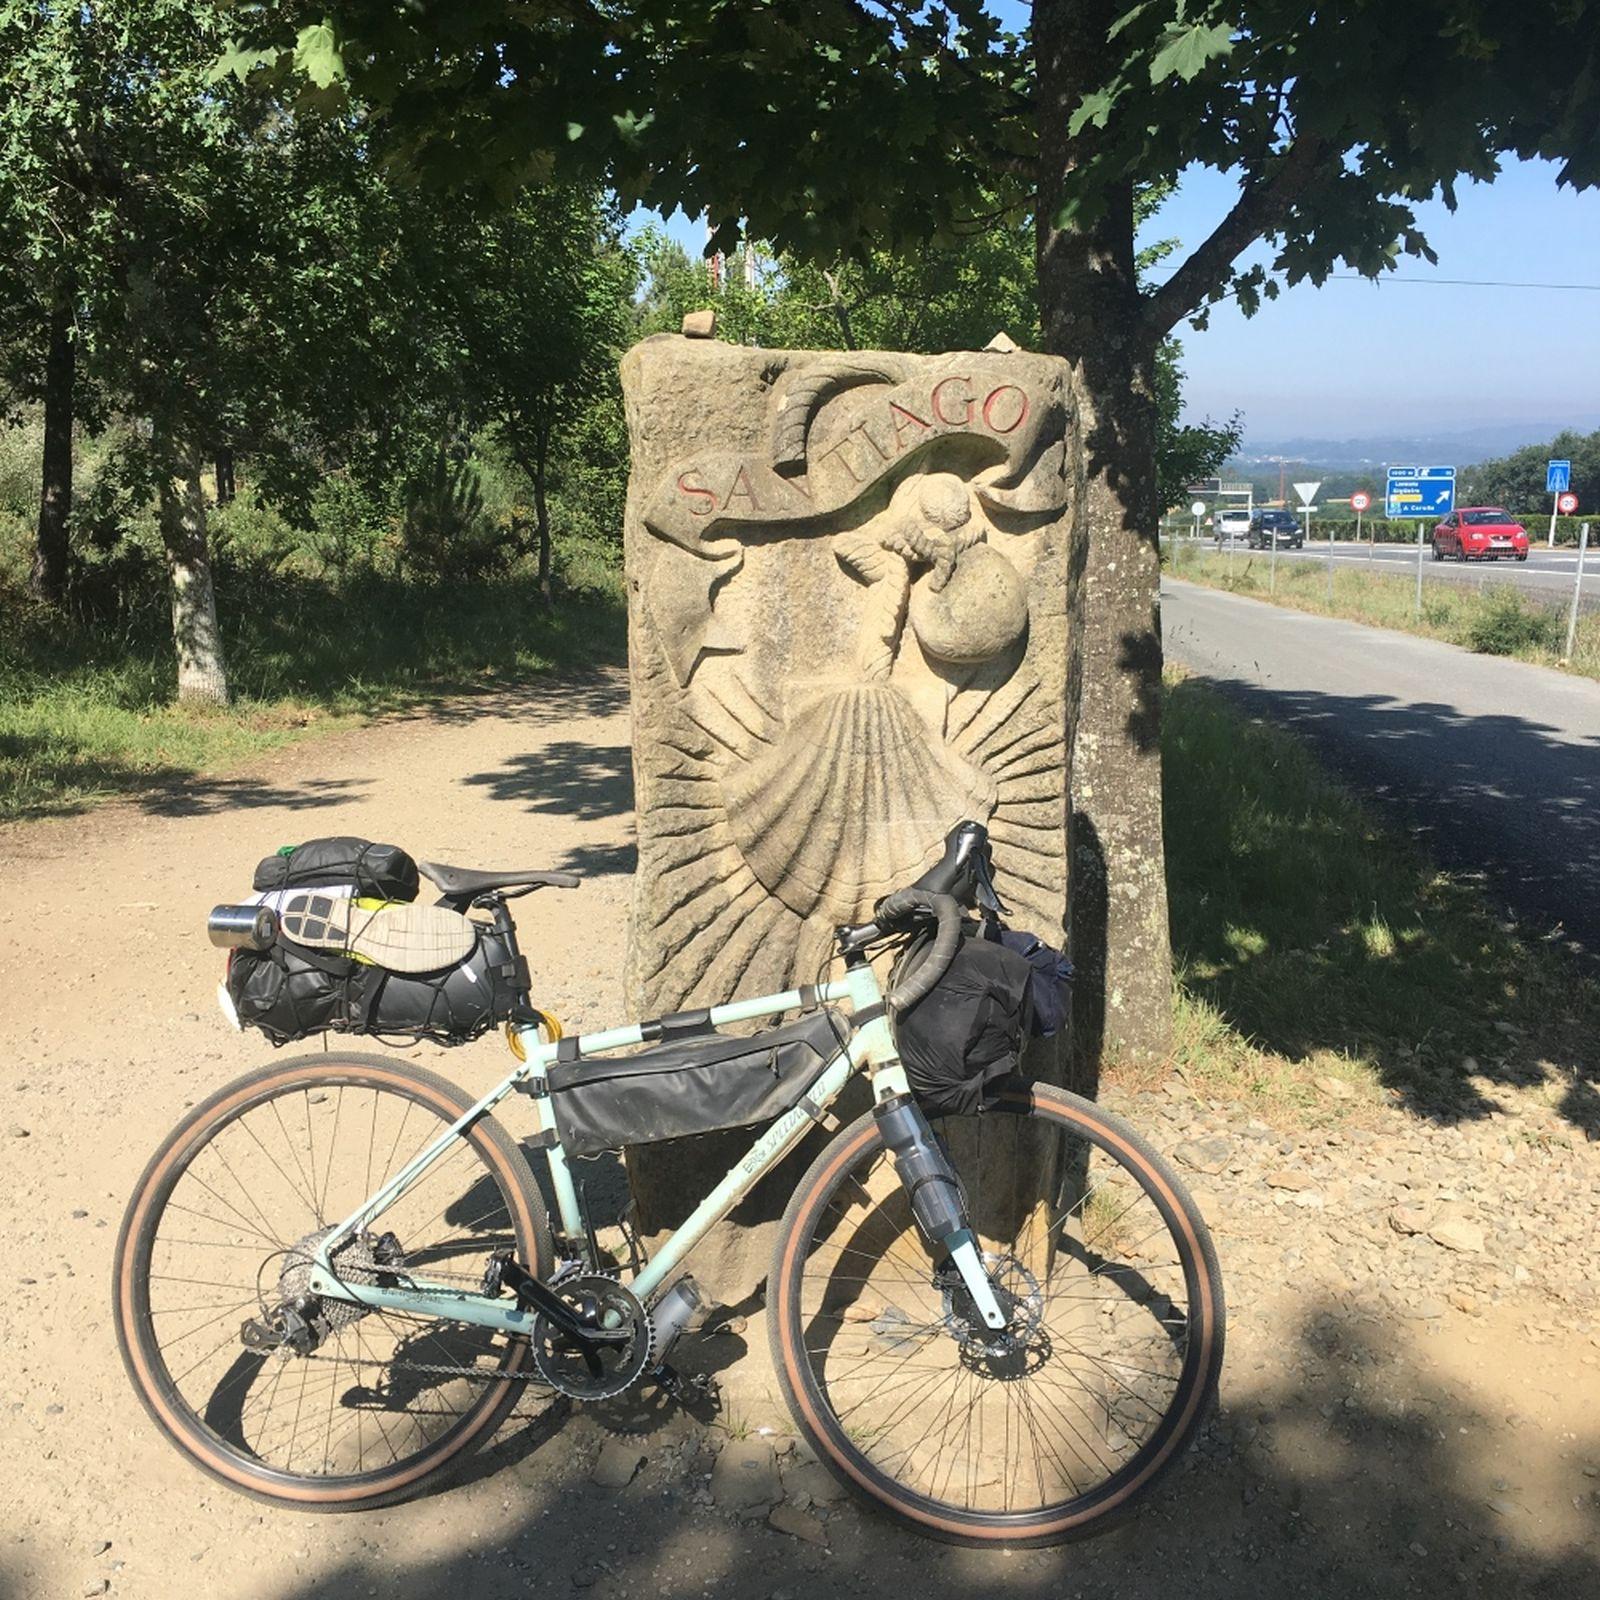 online retailer c5038 4d387 Specialized Sequoia recensione - Bikepacking.it